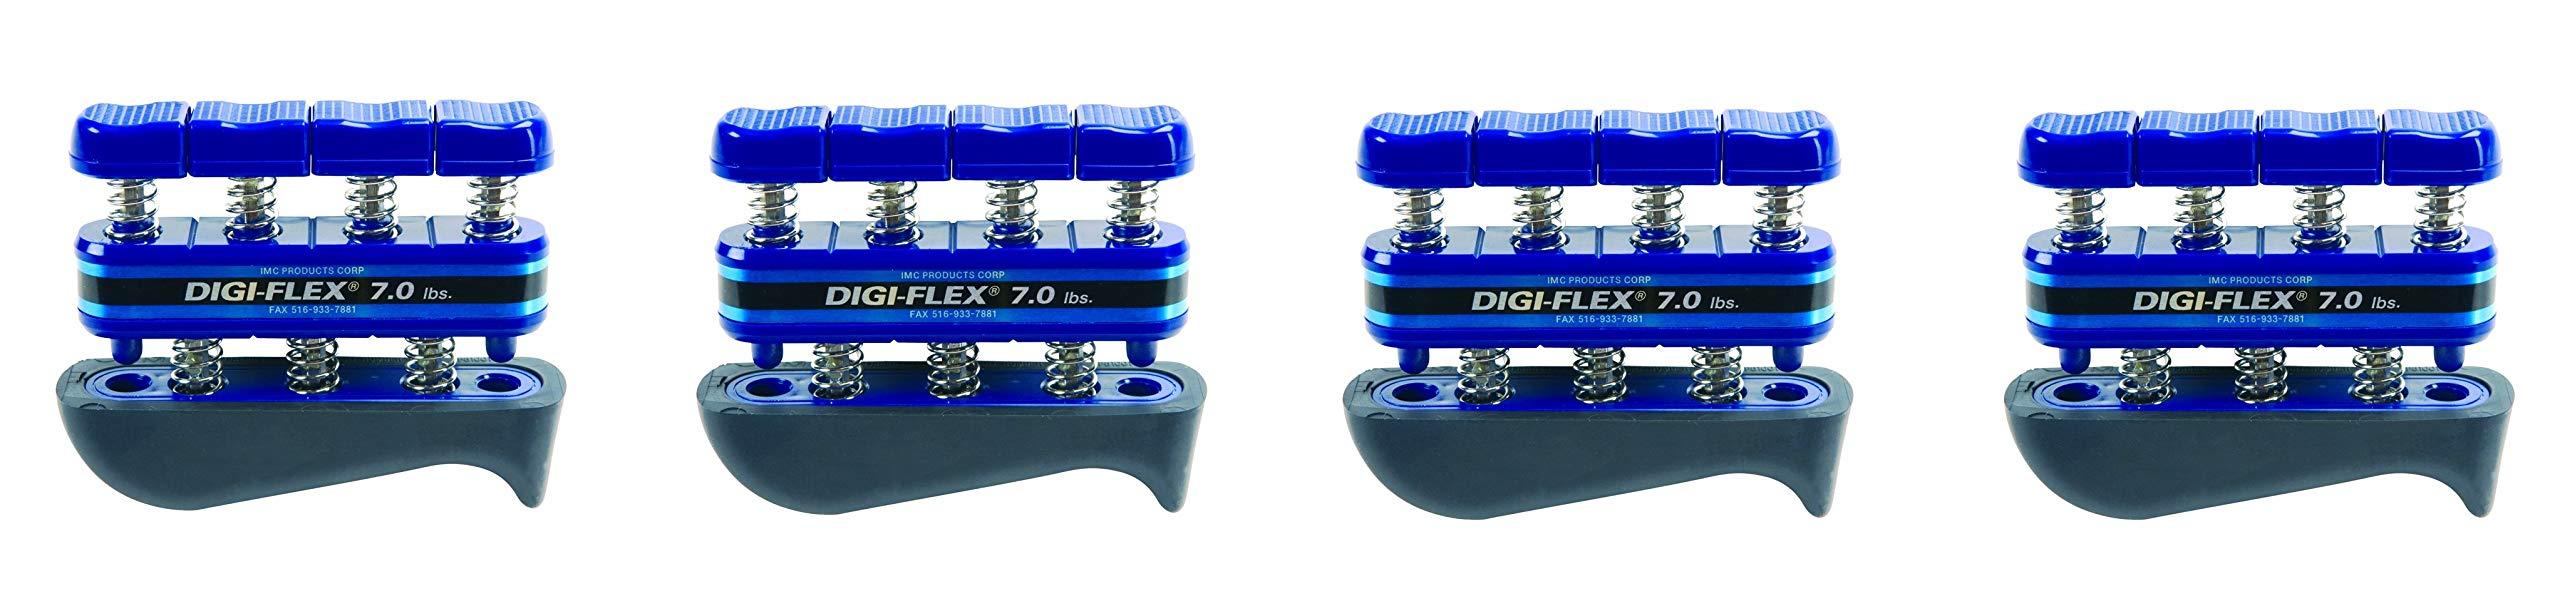 Digi-Flex Blue Hand and Finger Exercise System, 7 lbs Resistance (4-Pack)